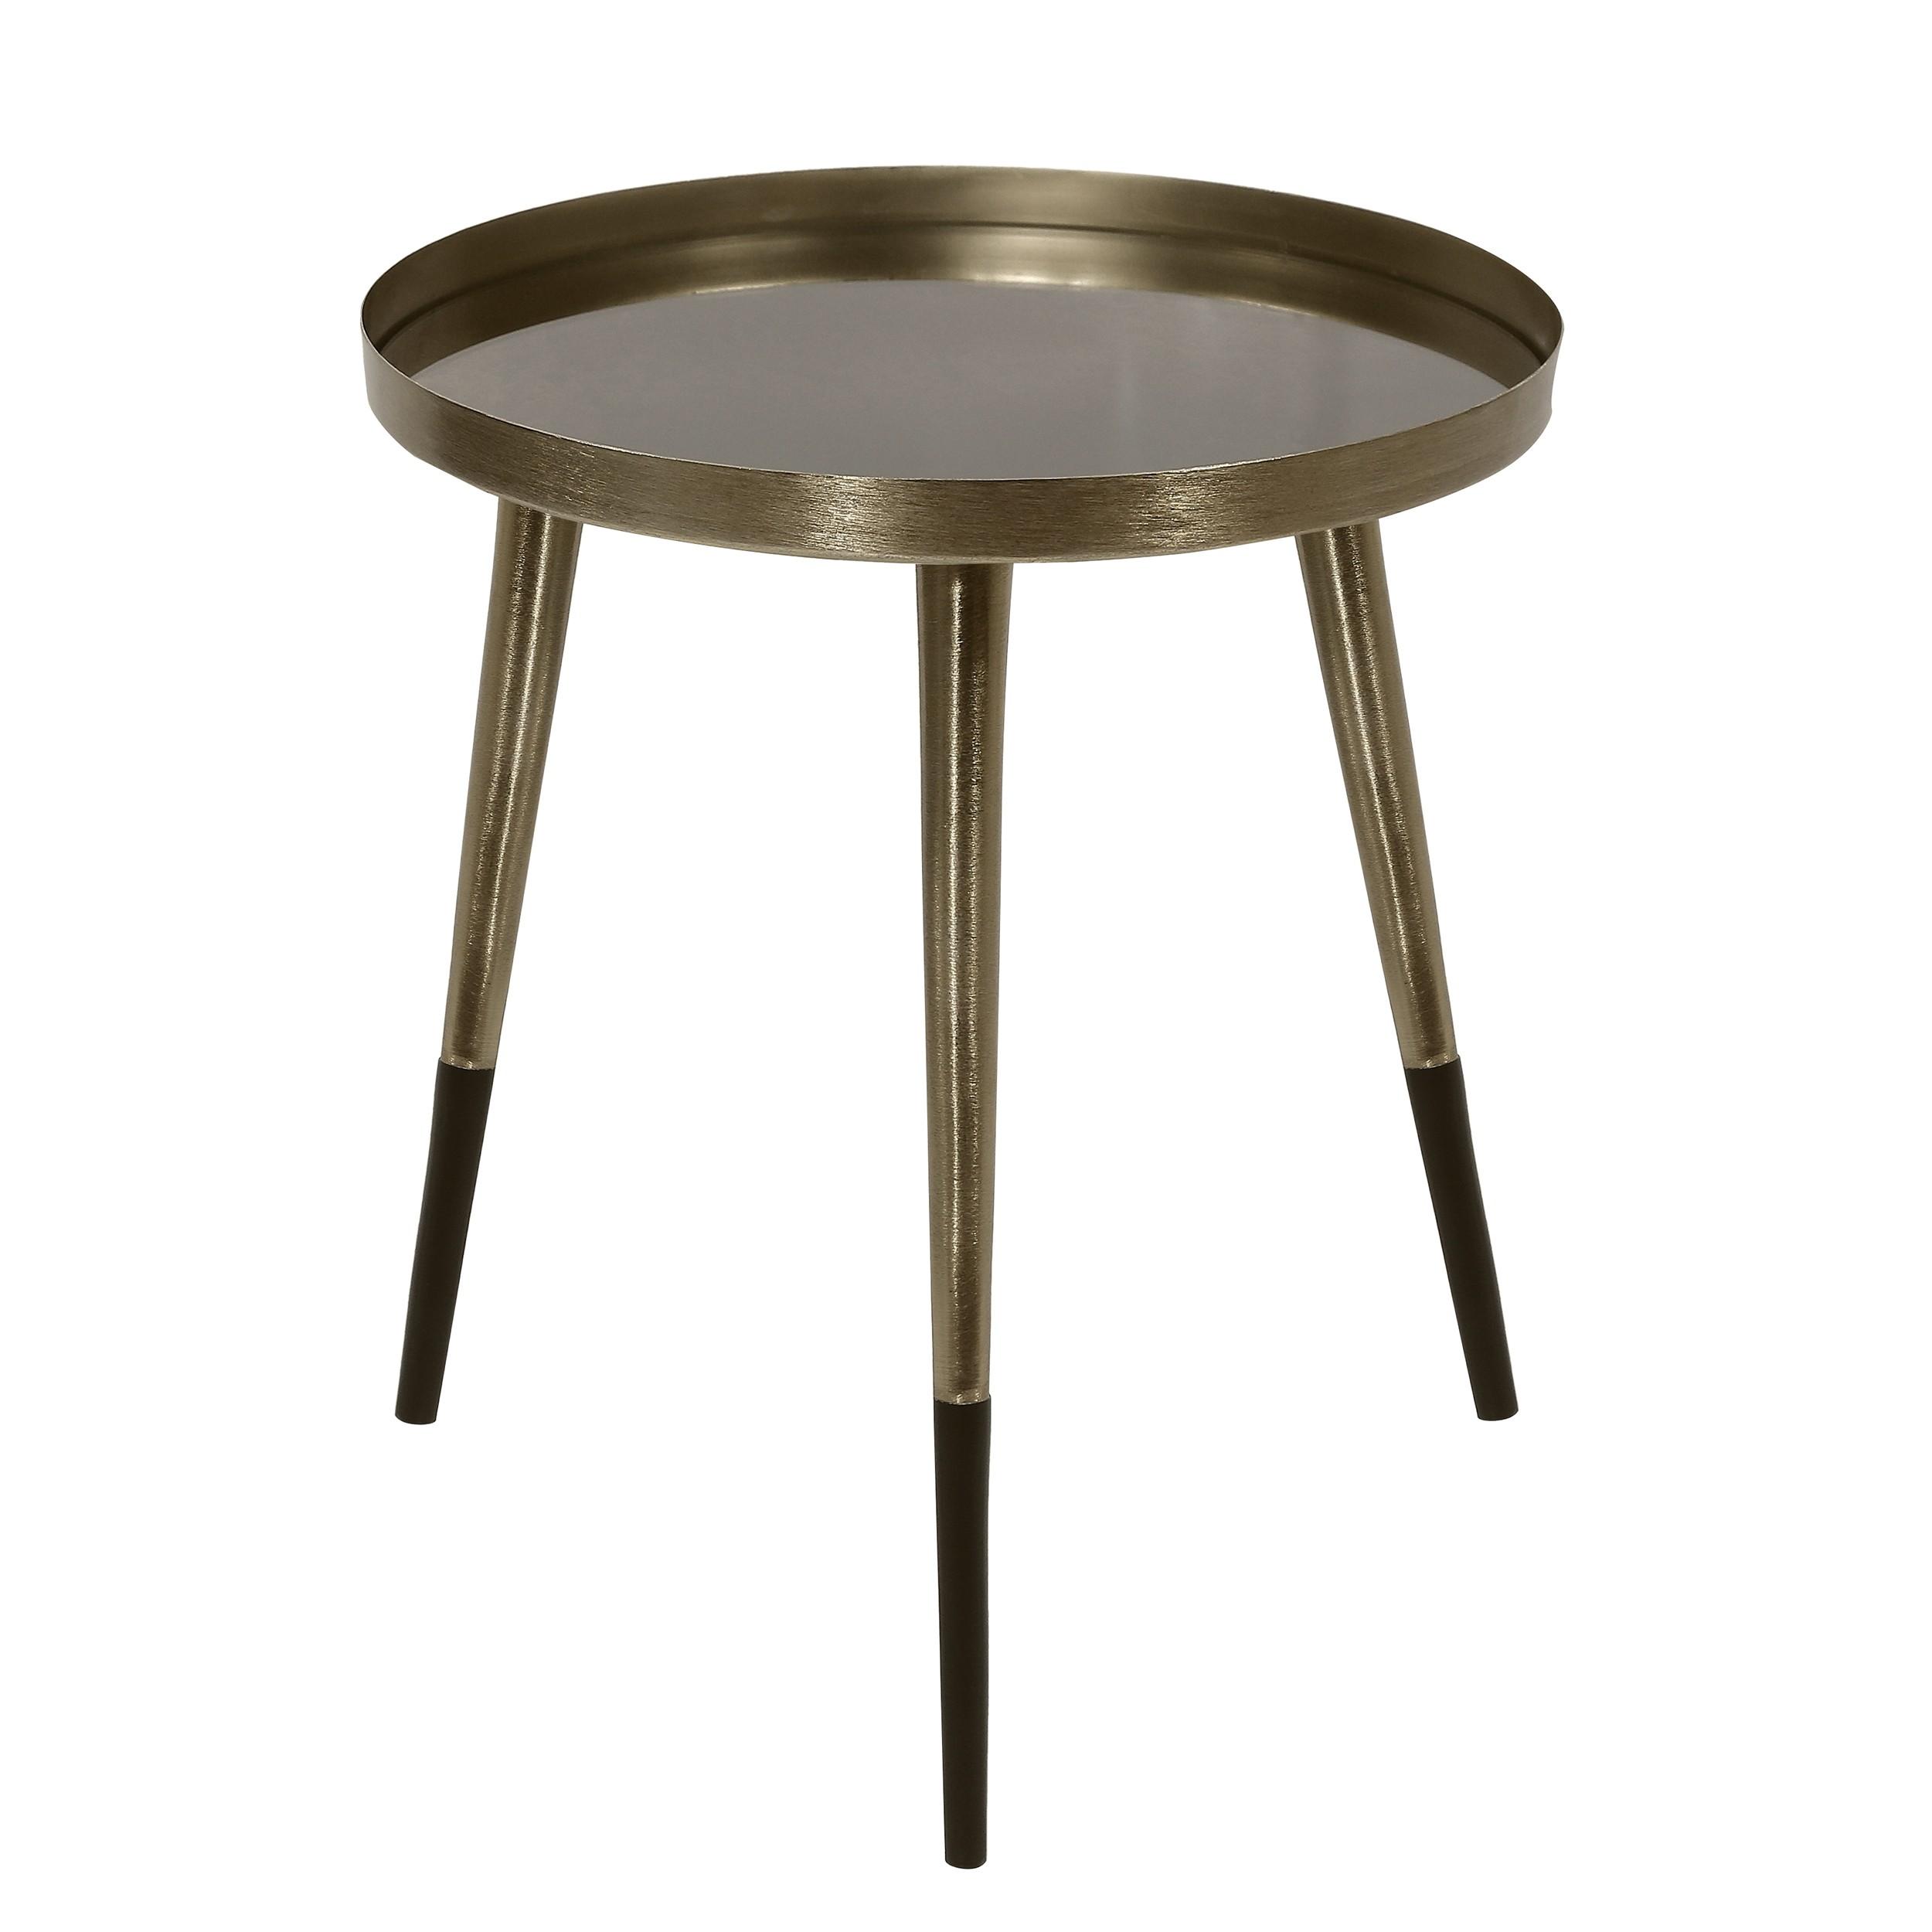 table basse ronde almalu laiton commandez les tables. Black Bedroom Furniture Sets. Home Design Ideas